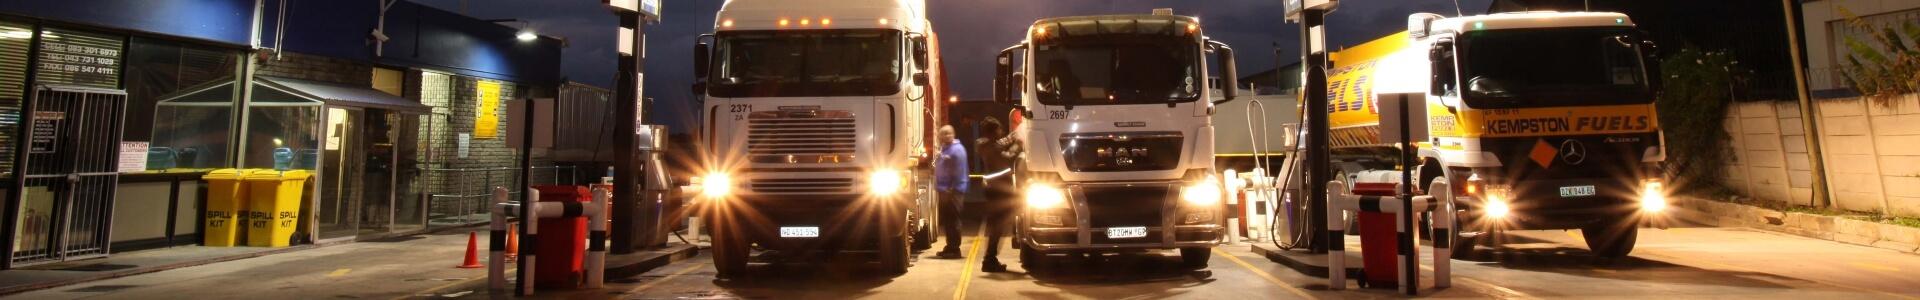 Truck Stop - The Kempston Group